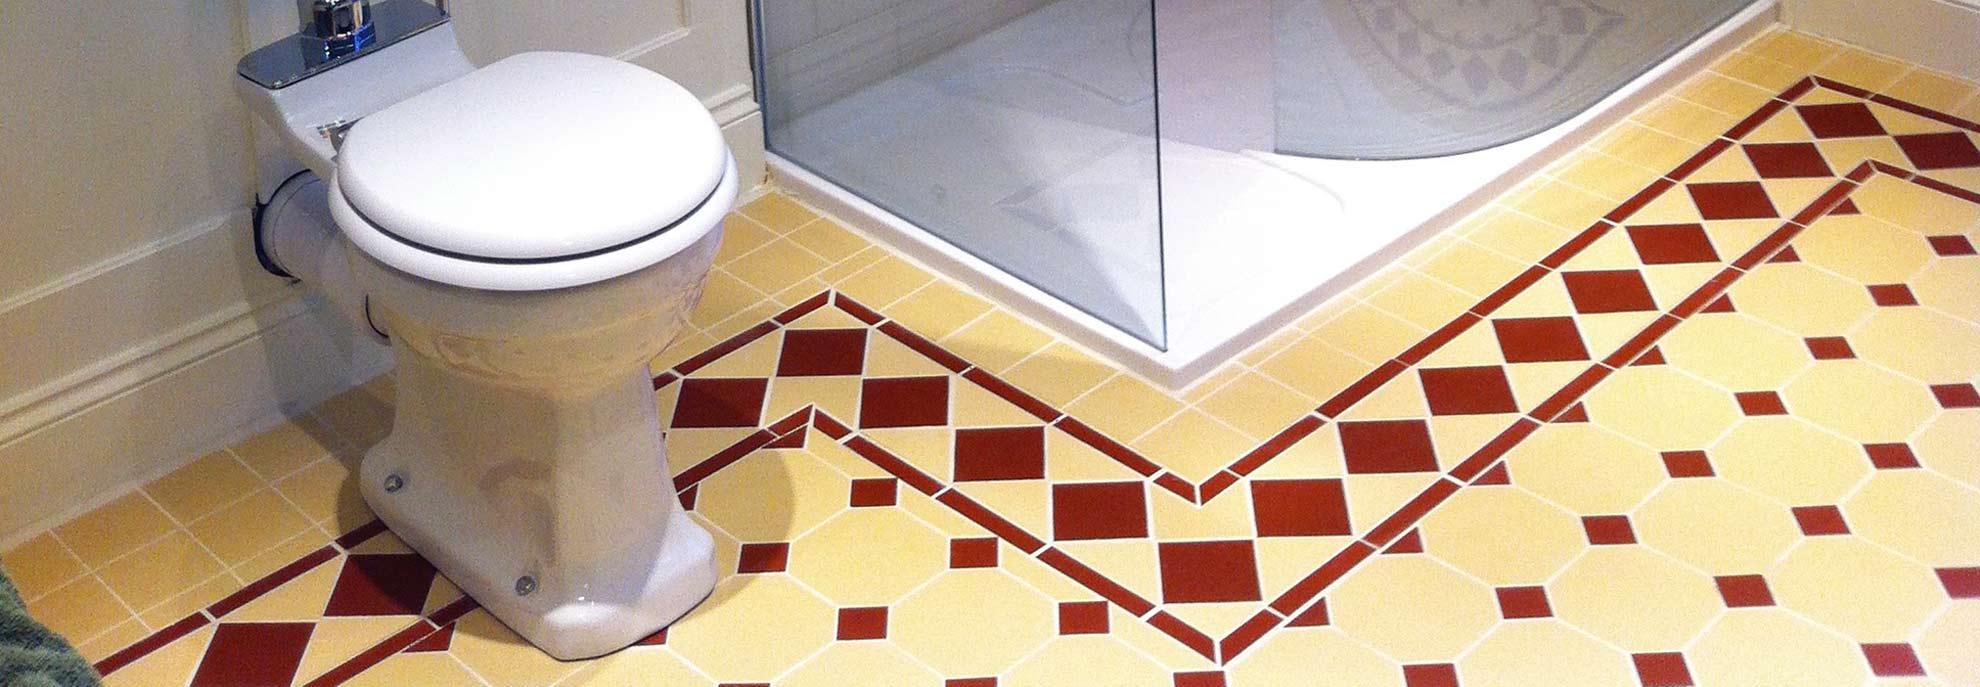 bathroom-fitting-cromer